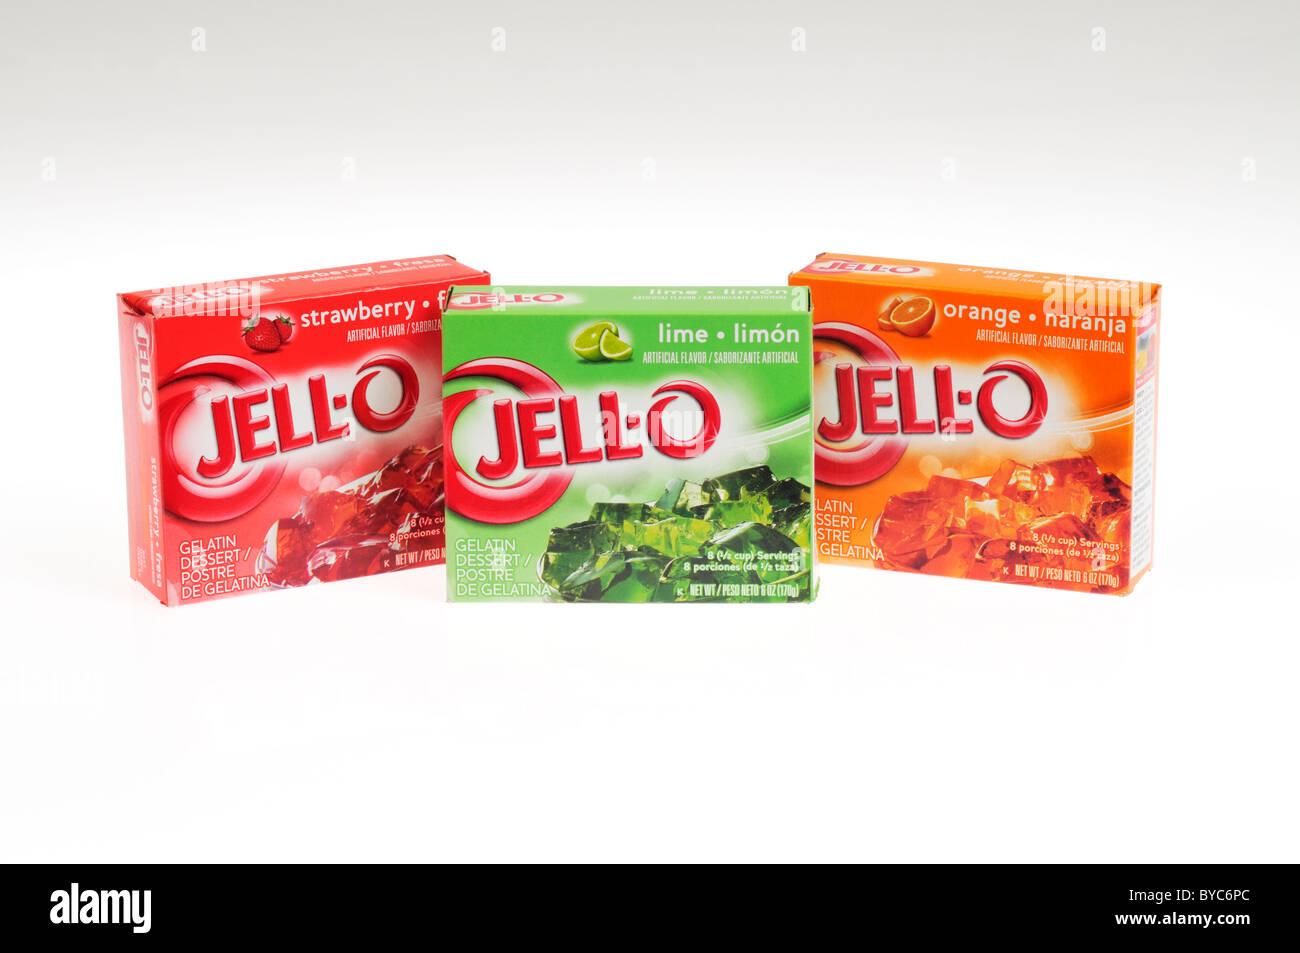 Boxes of powdered Jell-o gelatin mix on white background cutout - Stock Image